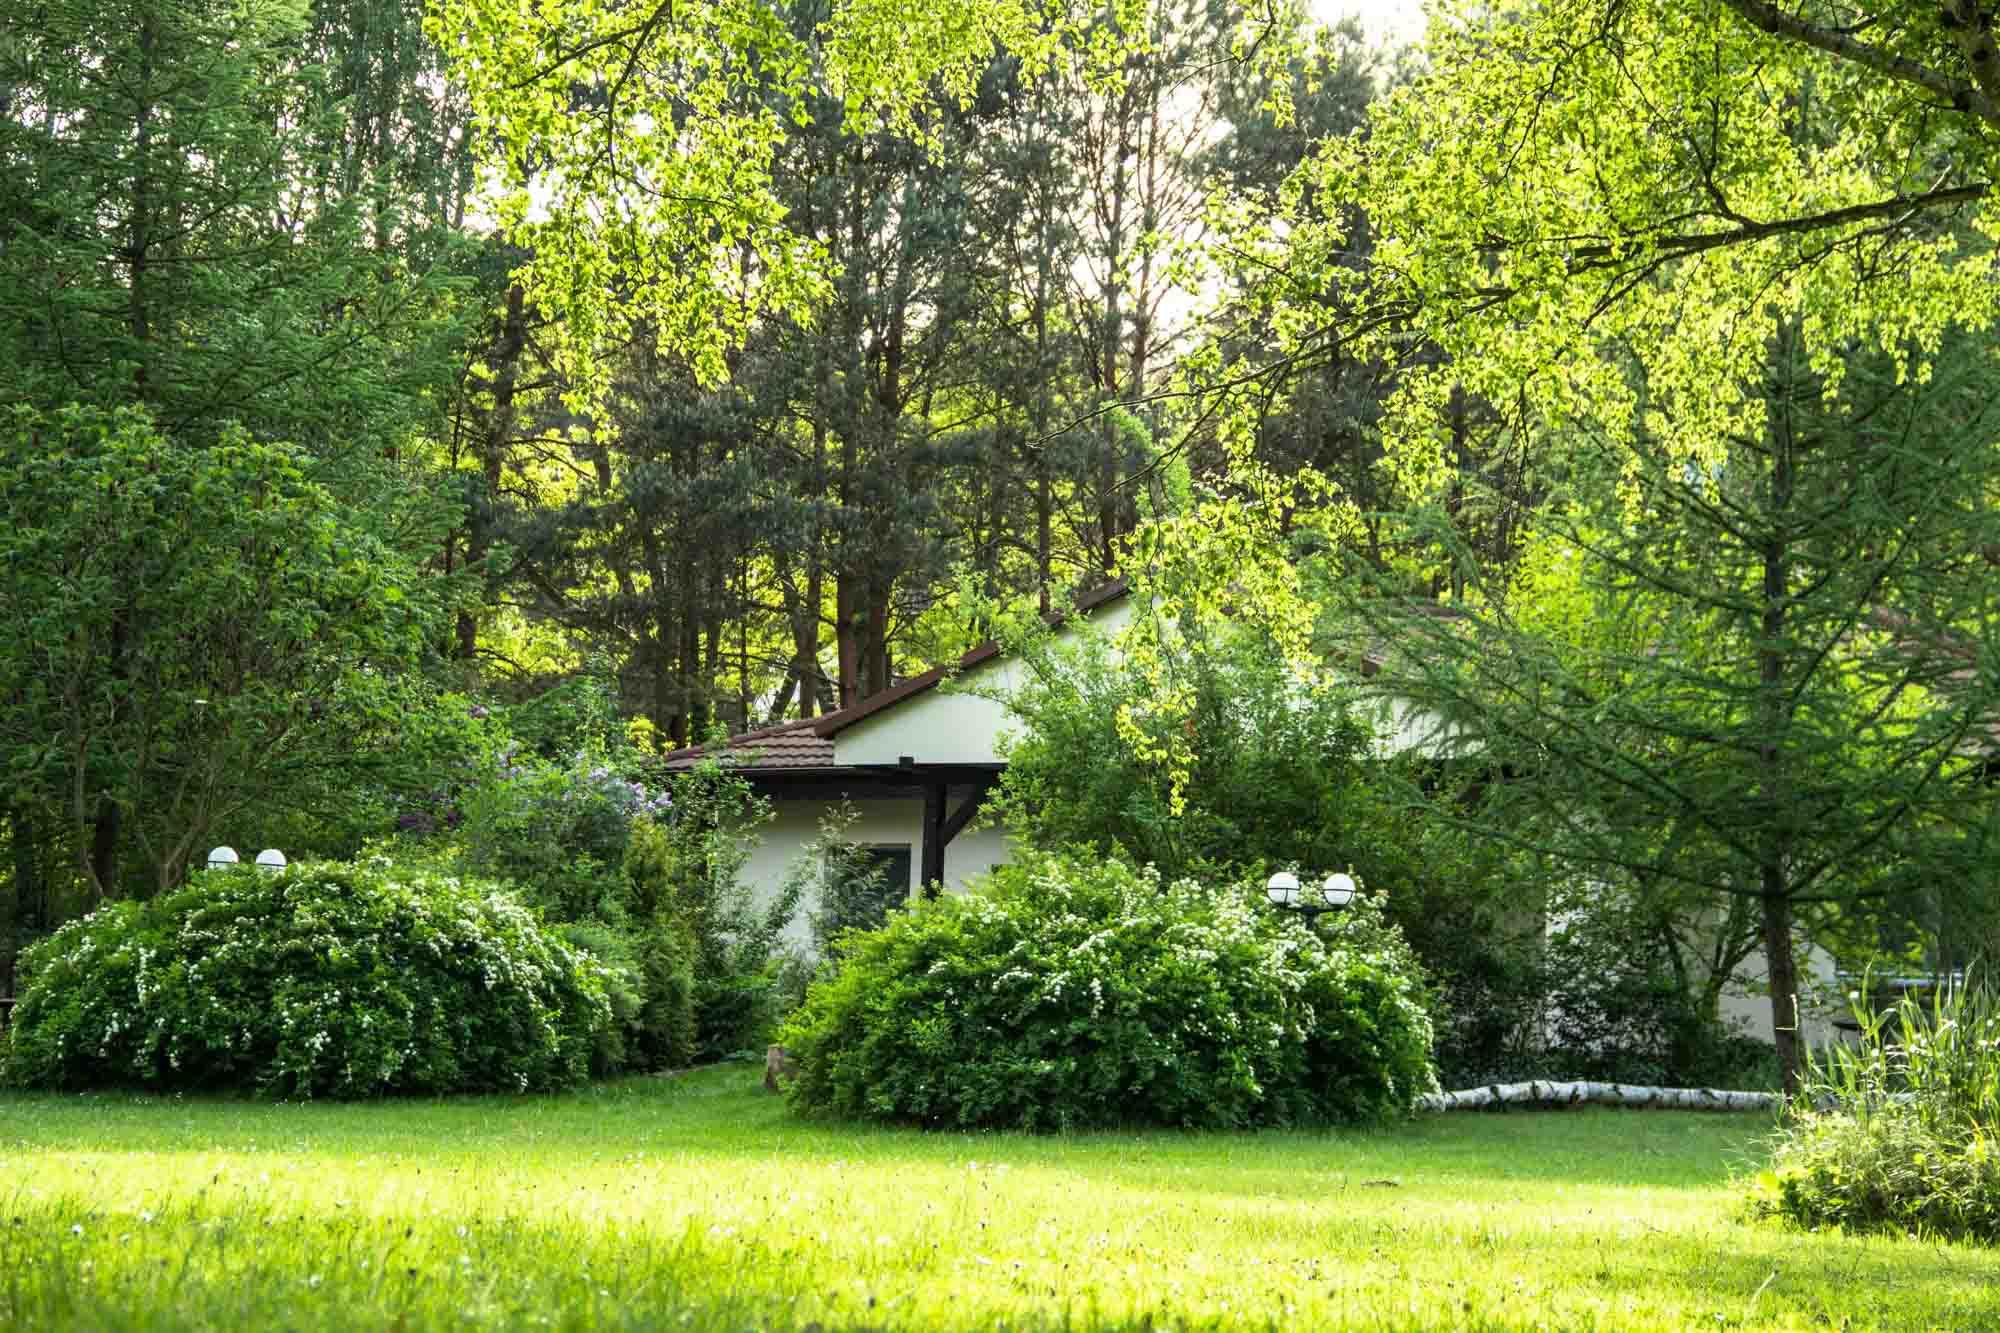 Lema, agroturystyka Wielkopolska nad jeziorem | agroturystyka Lubuskie